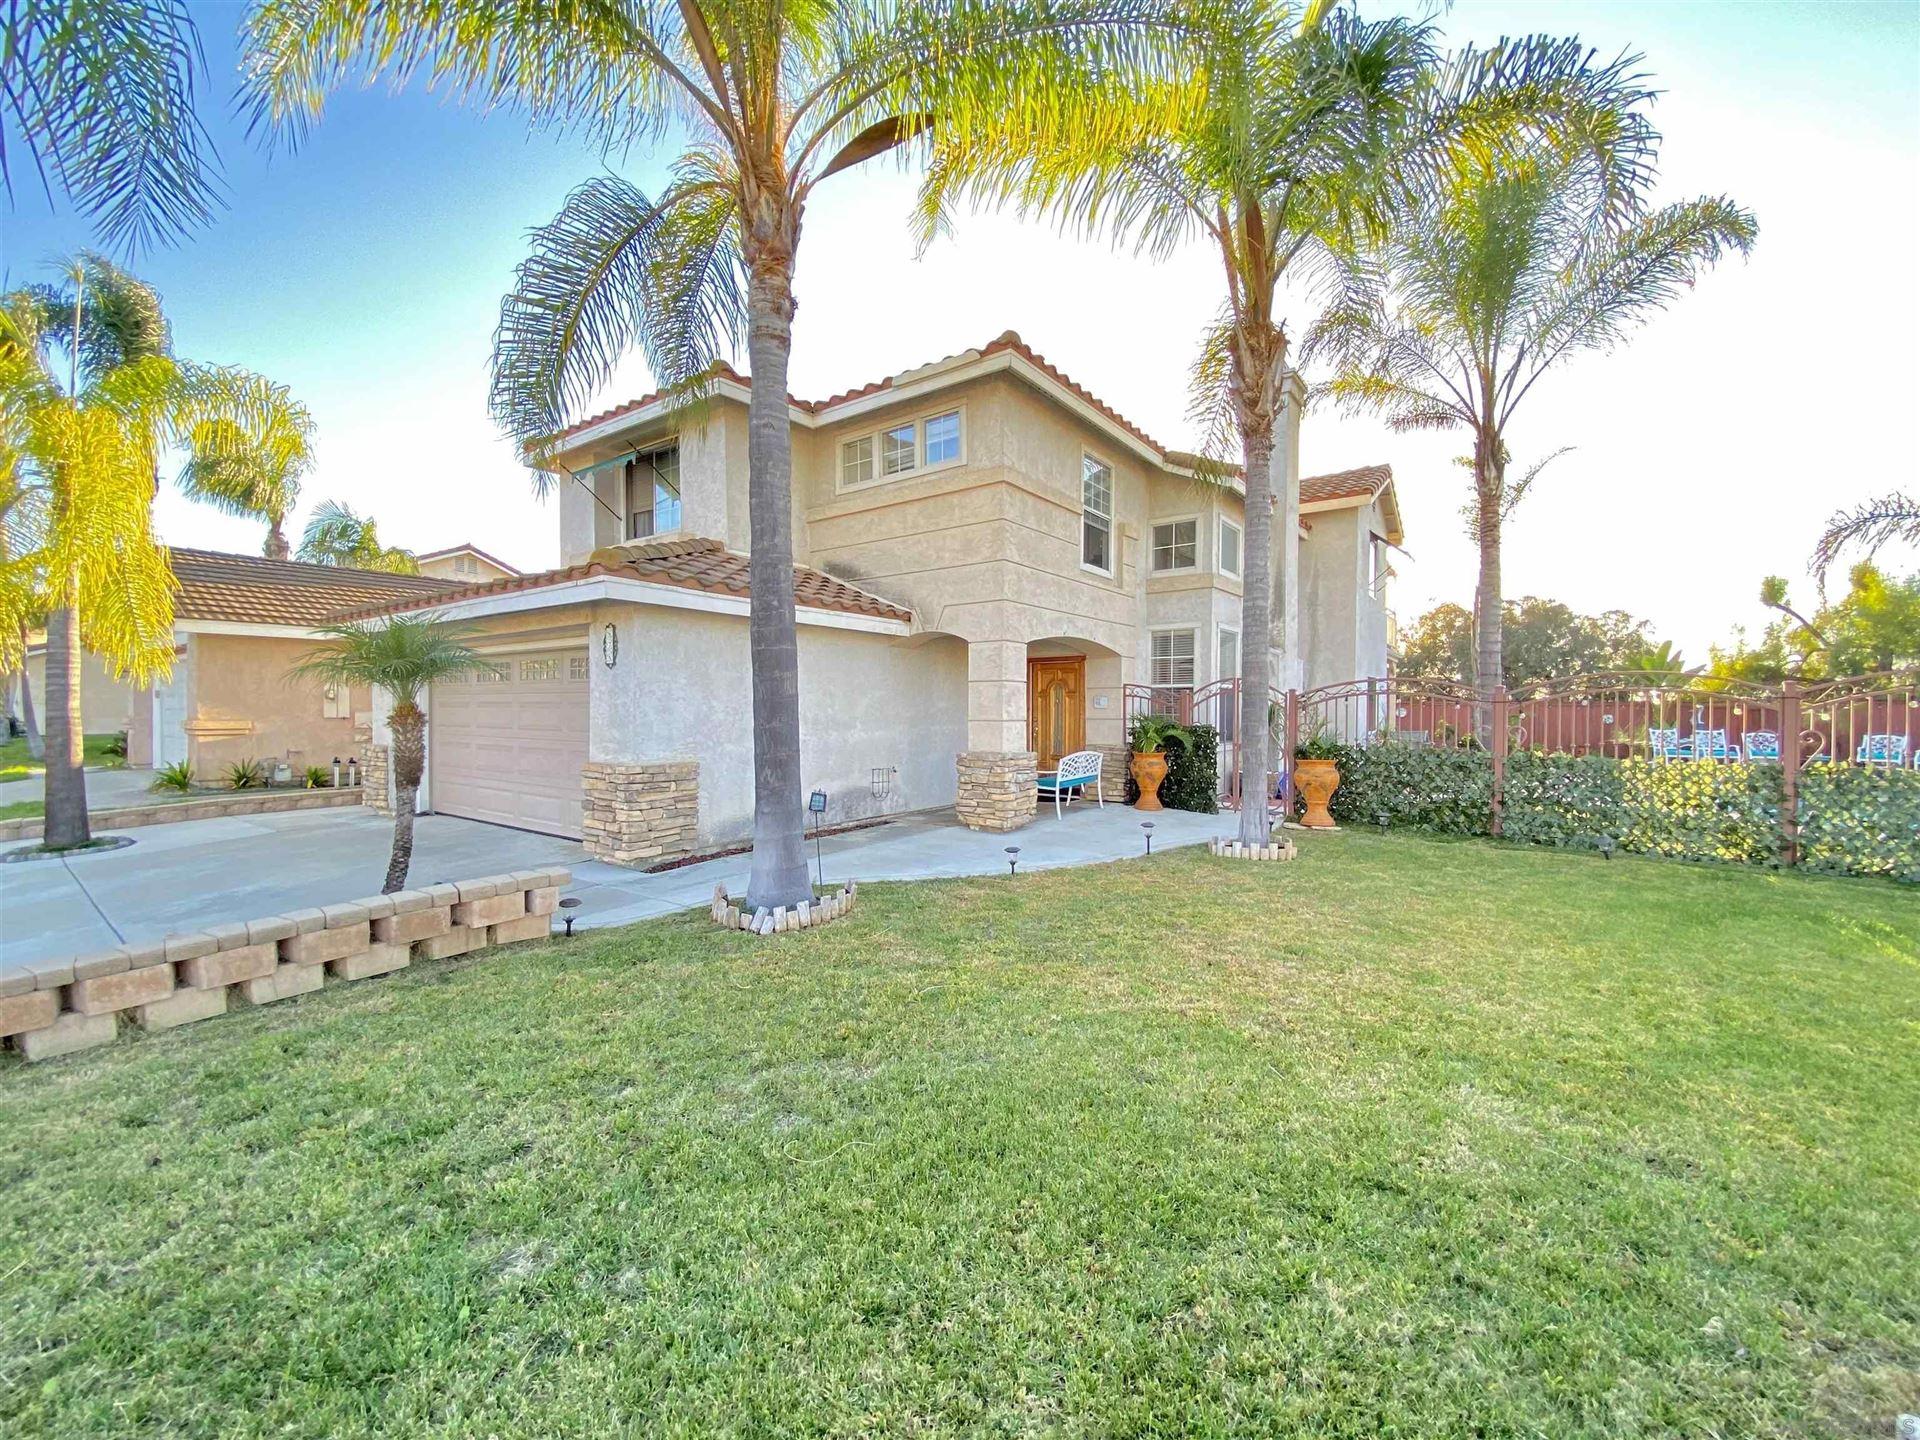 Photo of 878 Verin Lane, Chula Vista, CA 91910 (MLS # 210029419)